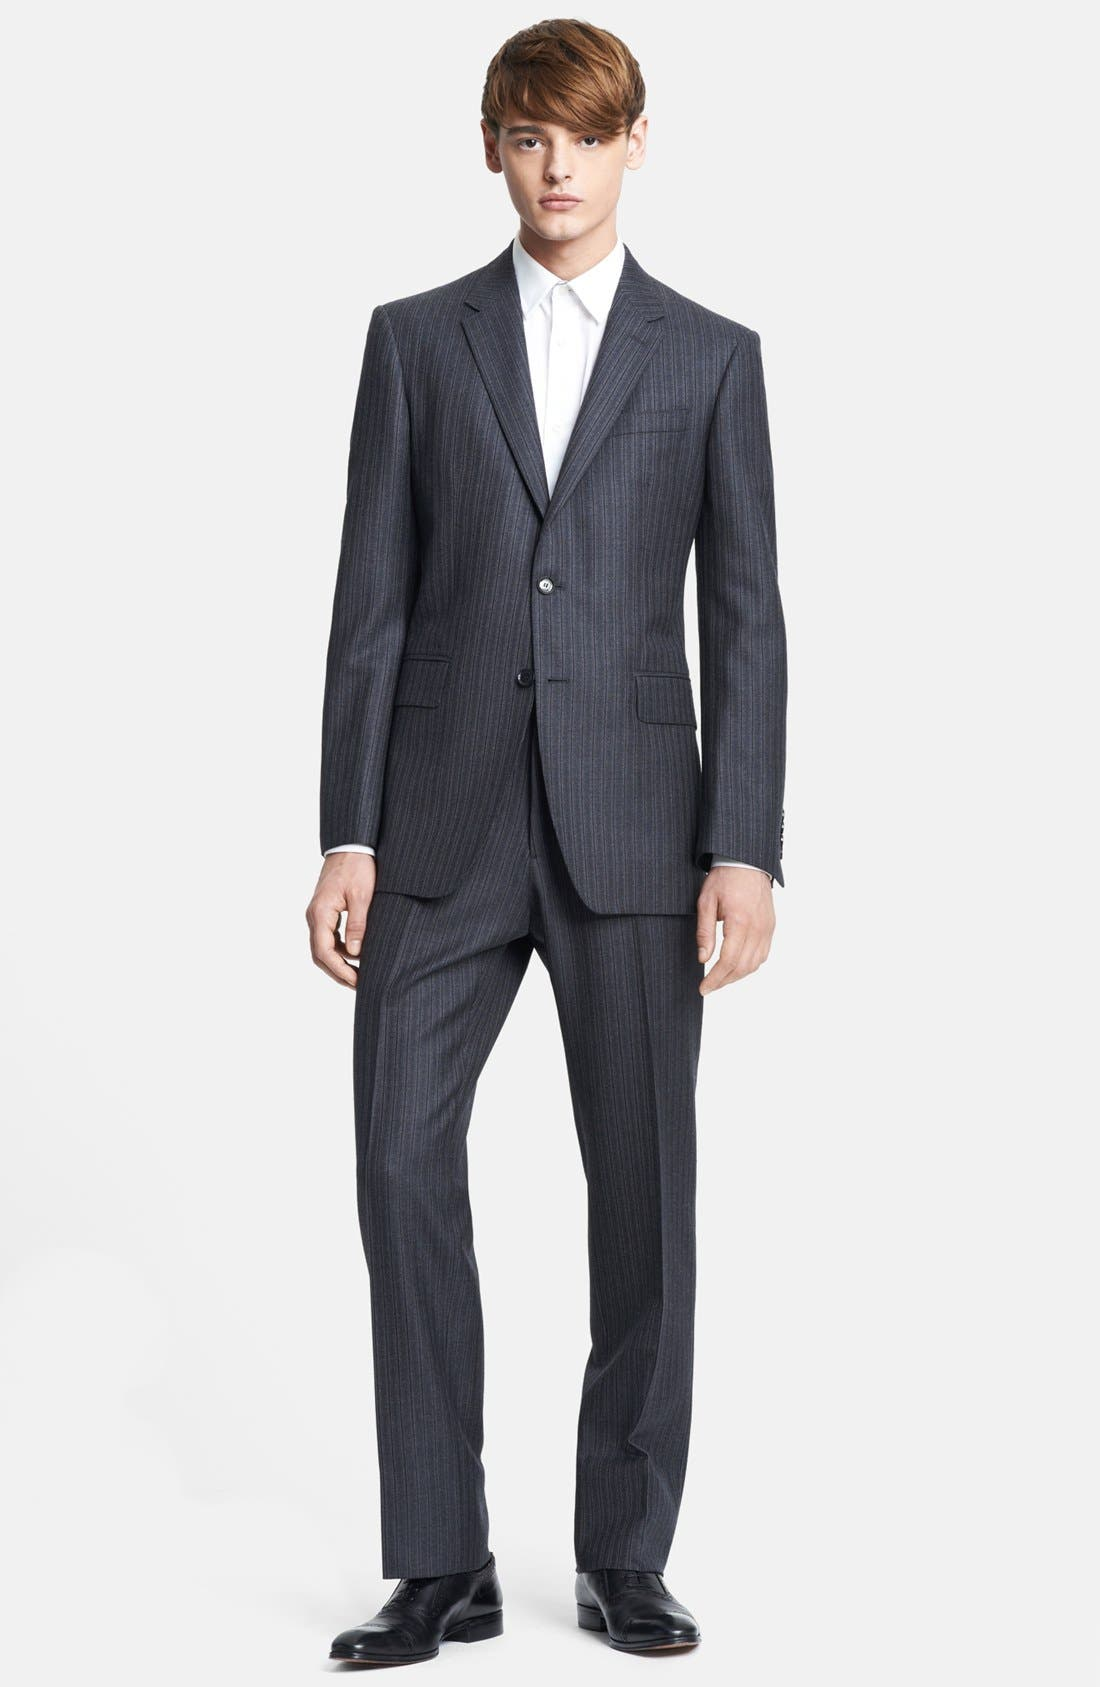 Main Image - Burberry London Grey Stripe Wool Suit